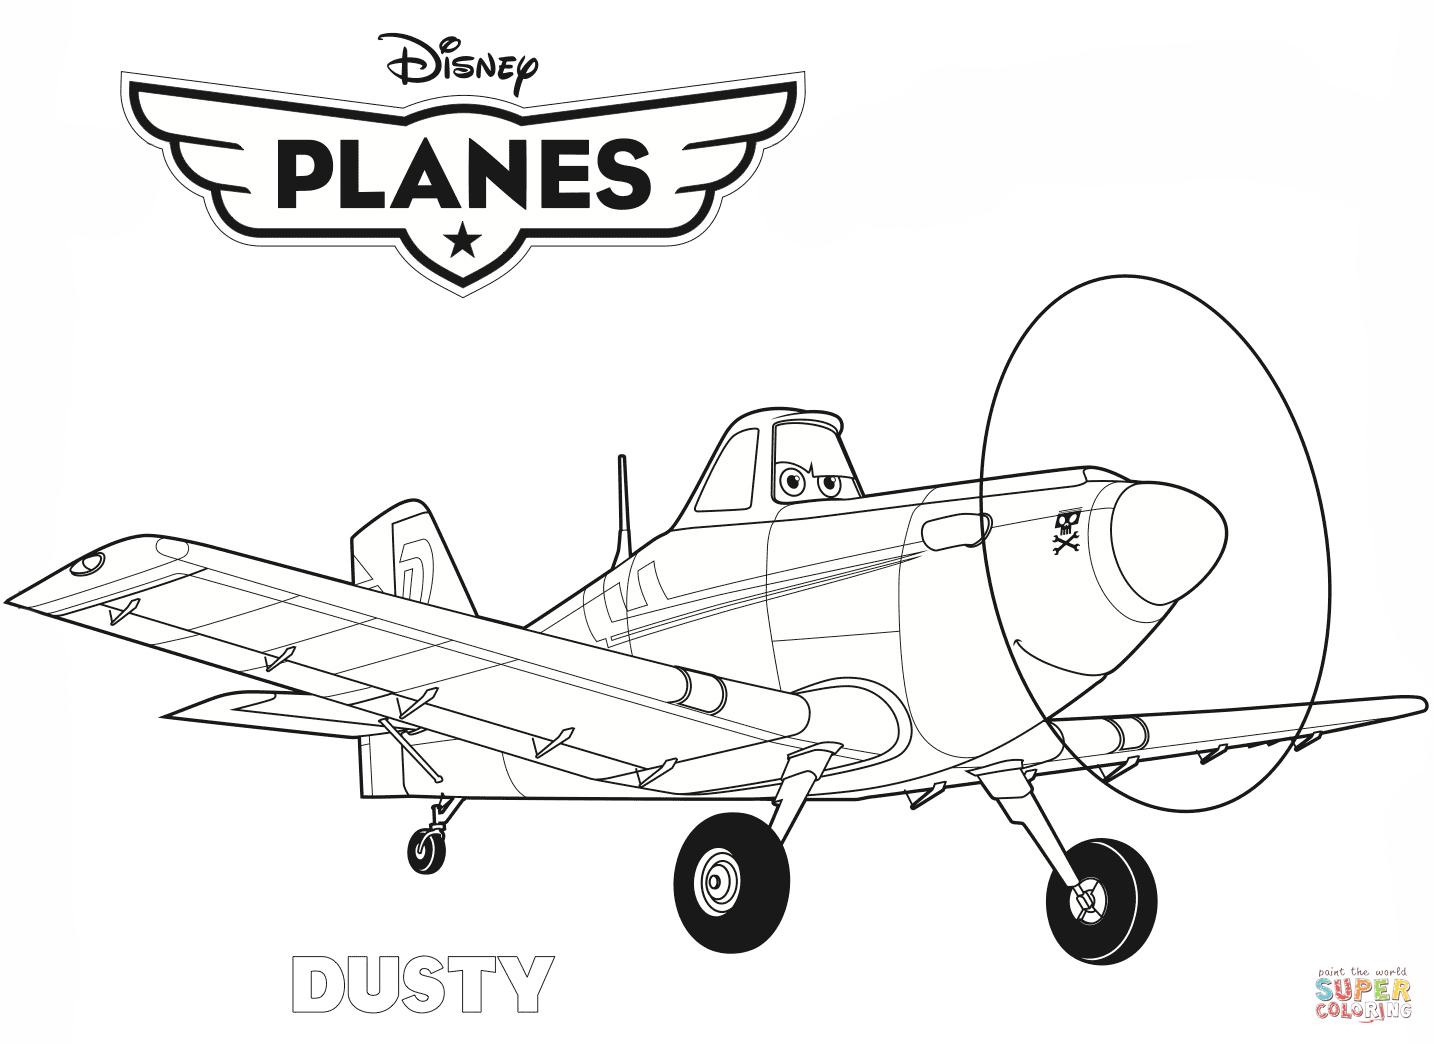 Disney Planes Dusty Coloring Page